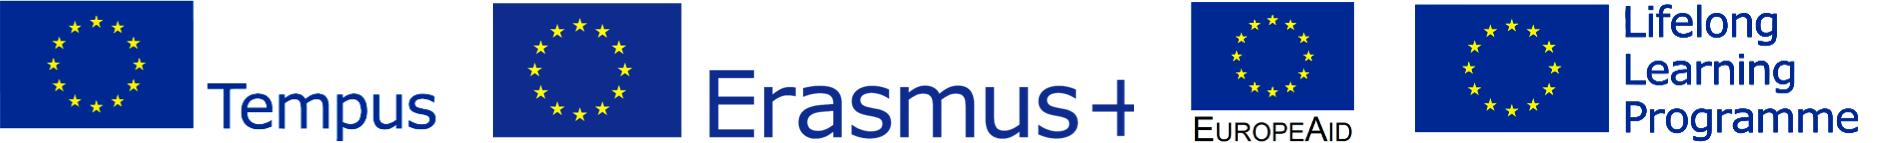 EU_logos_combined1